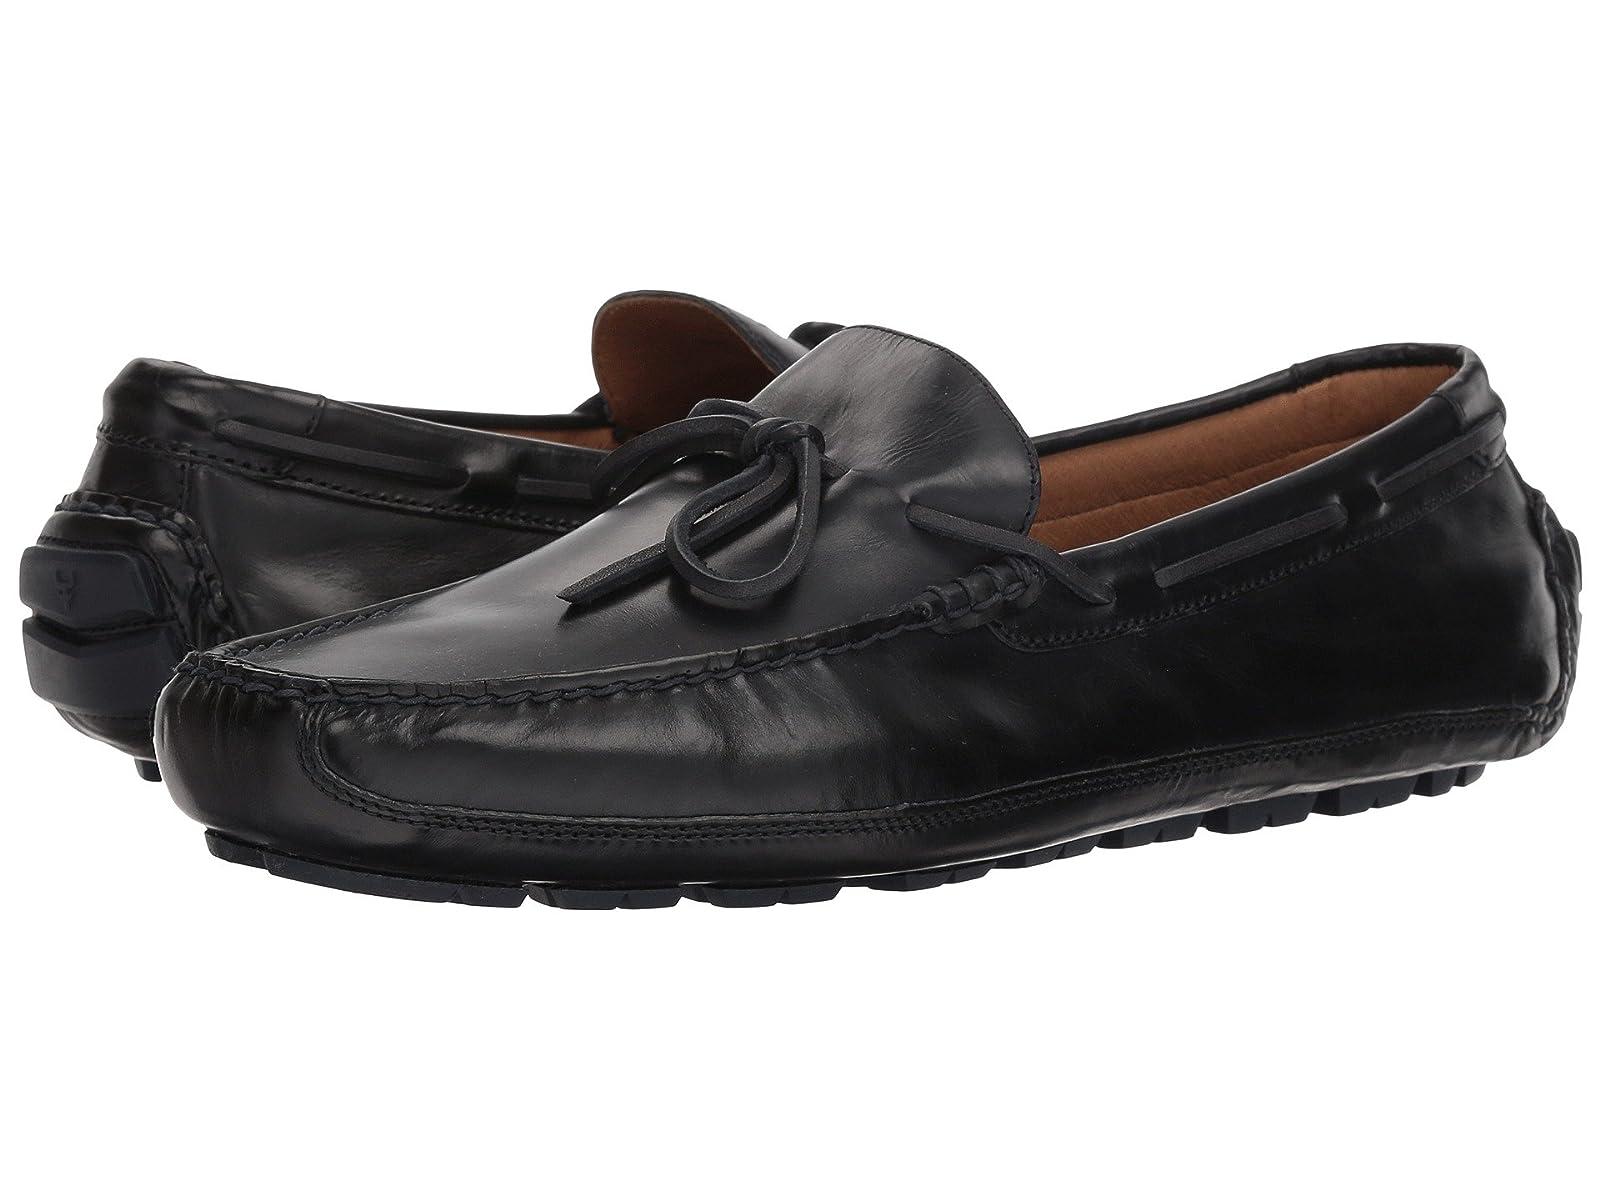 Trask DillonAtmospheric grades have affordable shoes